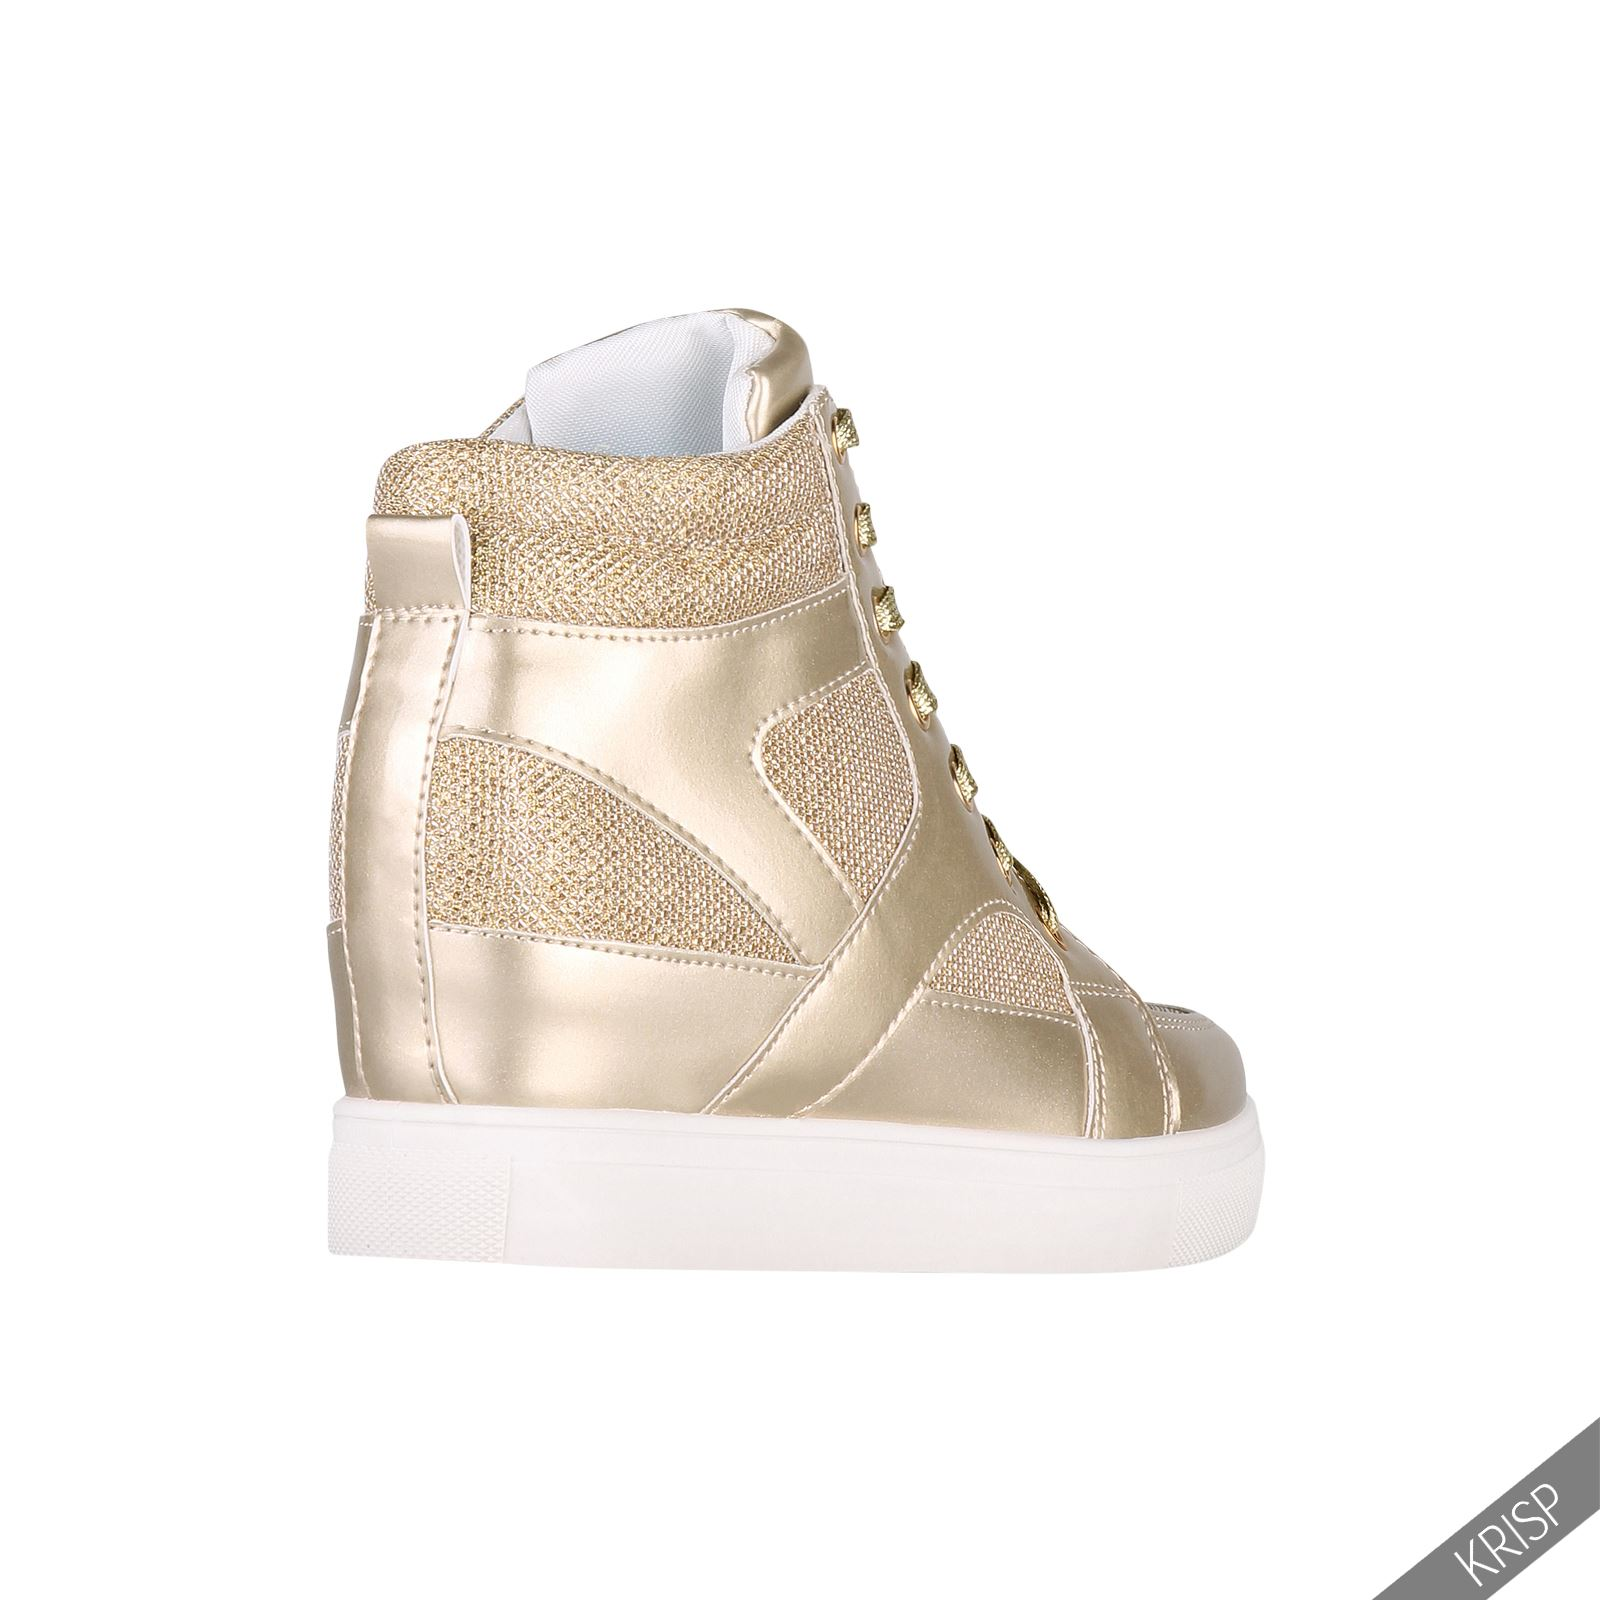 5aef25c1c0 Damen Glitter High Top Sneaker Wedge Keilabsatz Strass Perlen ...